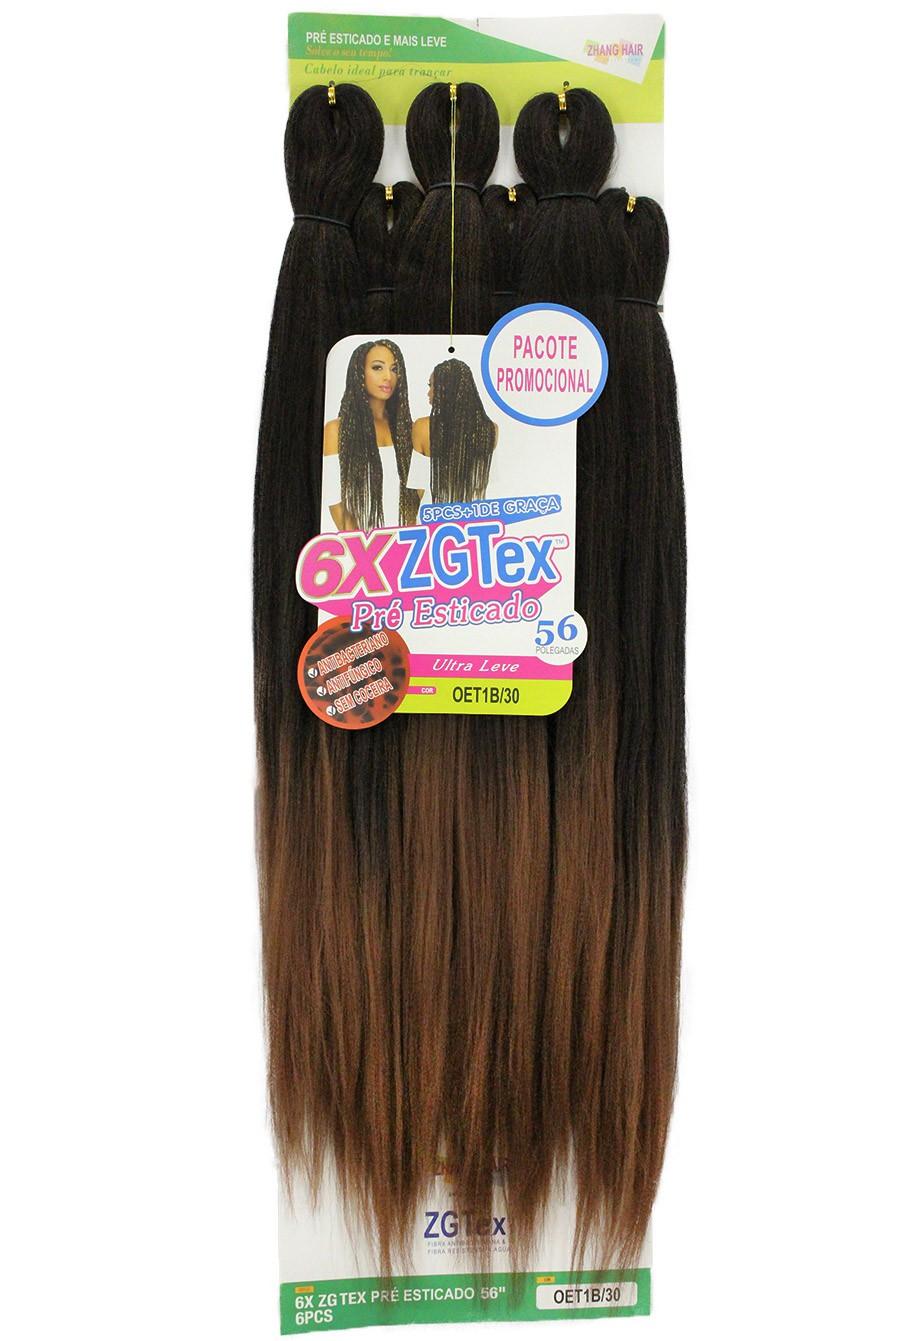 Jumbo - Zhang Hair - 6X ZGTex (400g) - Cor: OET1B/30